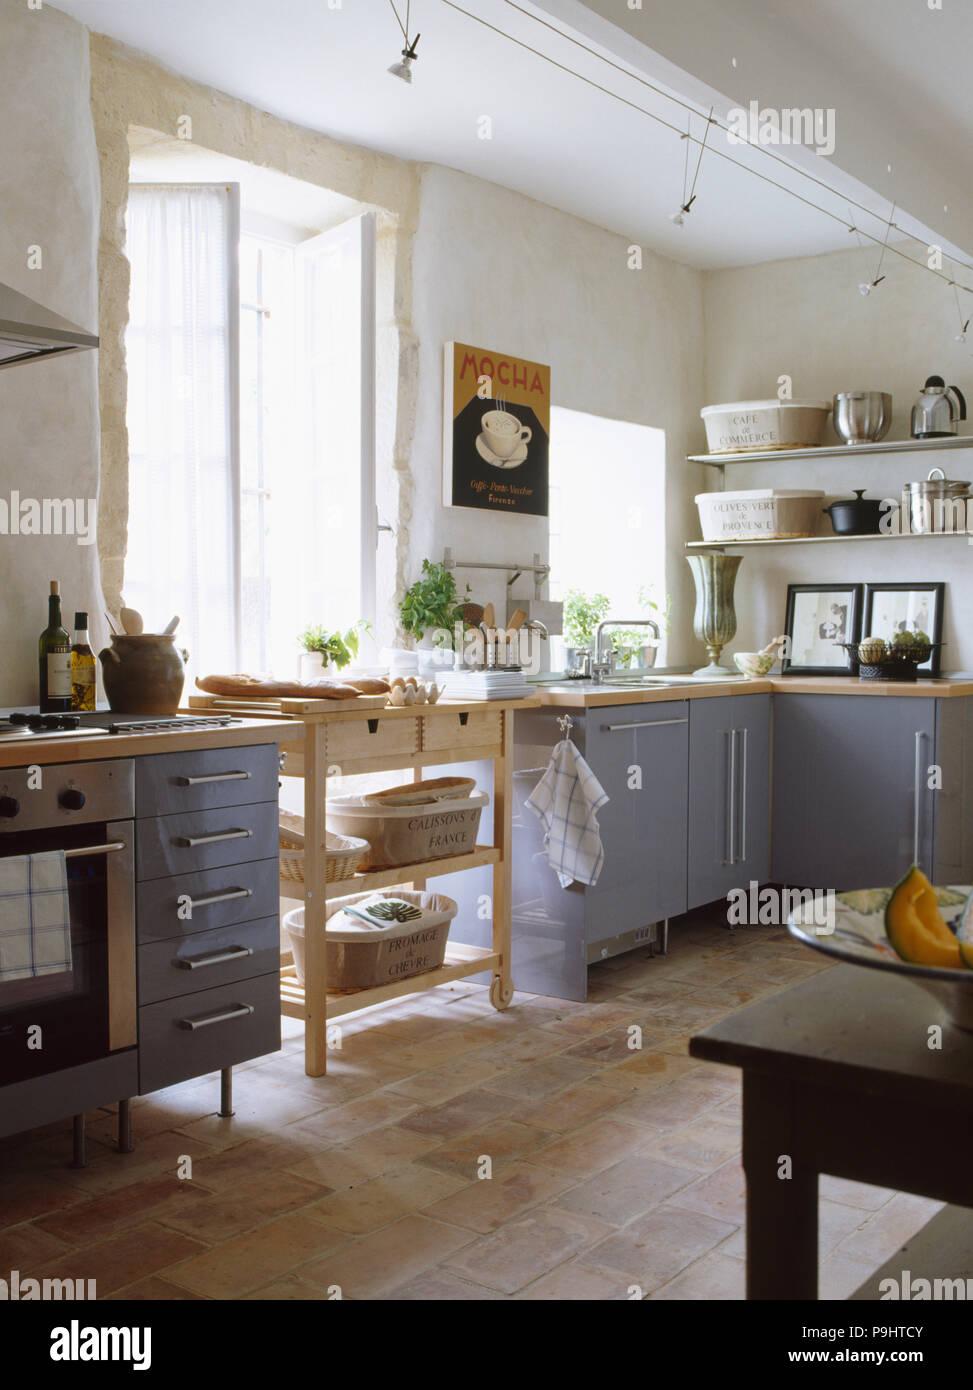 Pavimento in piastrelle di terracotta in bianca e moderna cucina ...